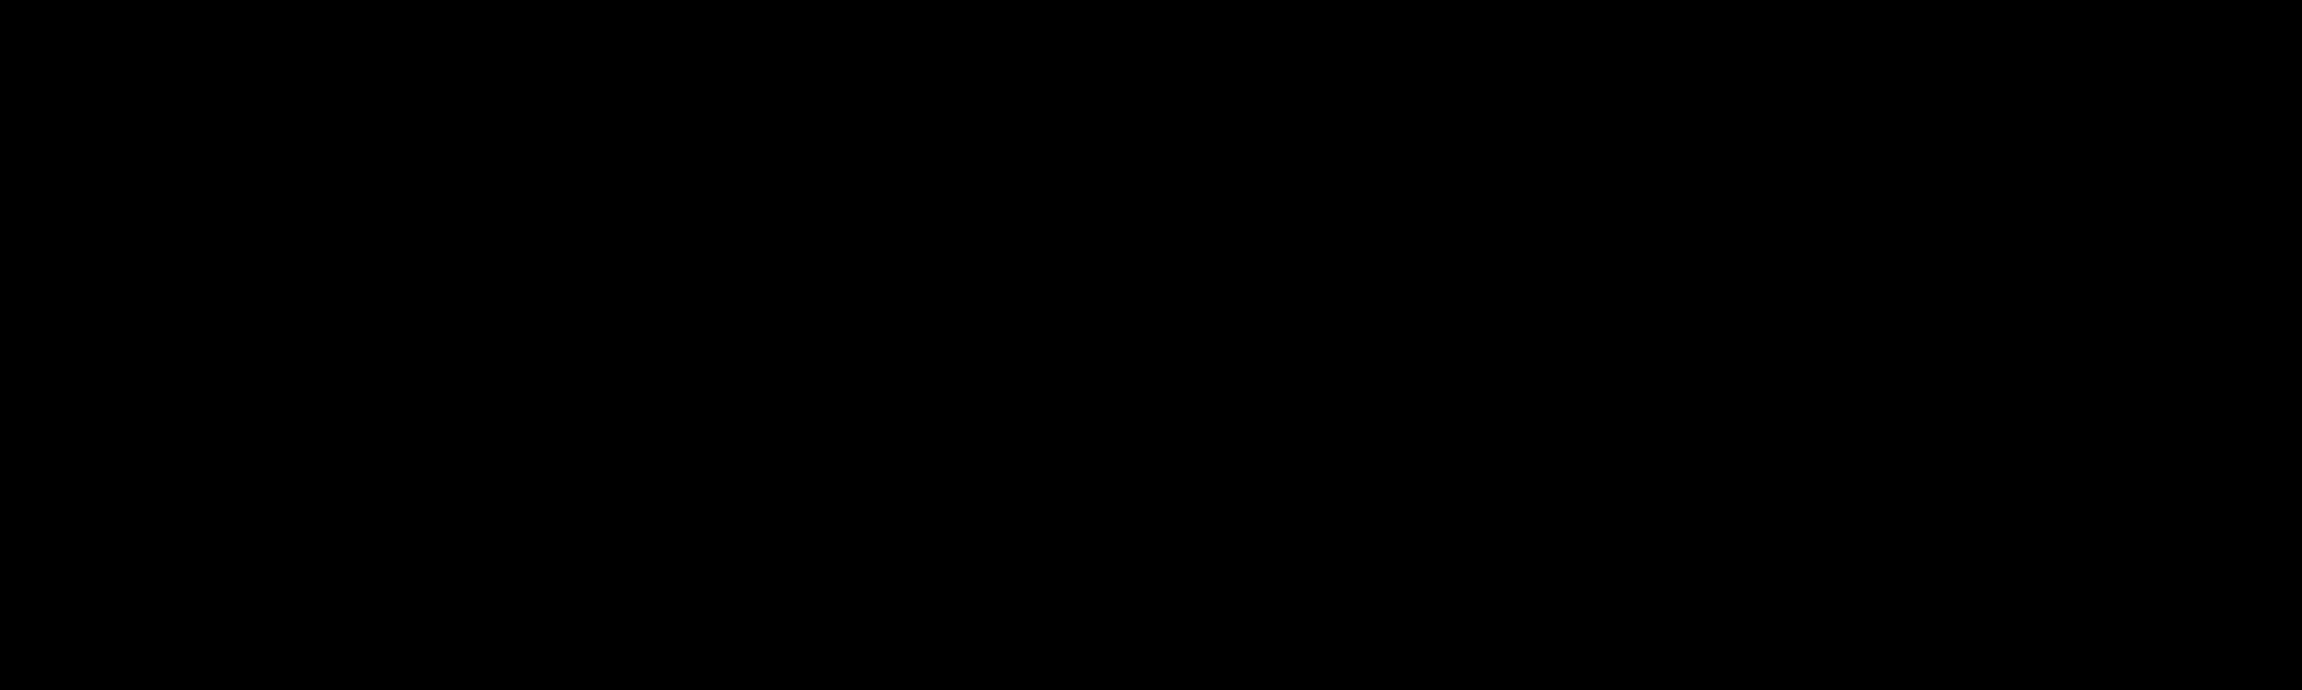 Aripiprazole-d<sub>8</sub> (piperazine-d<sub>8)</sub>